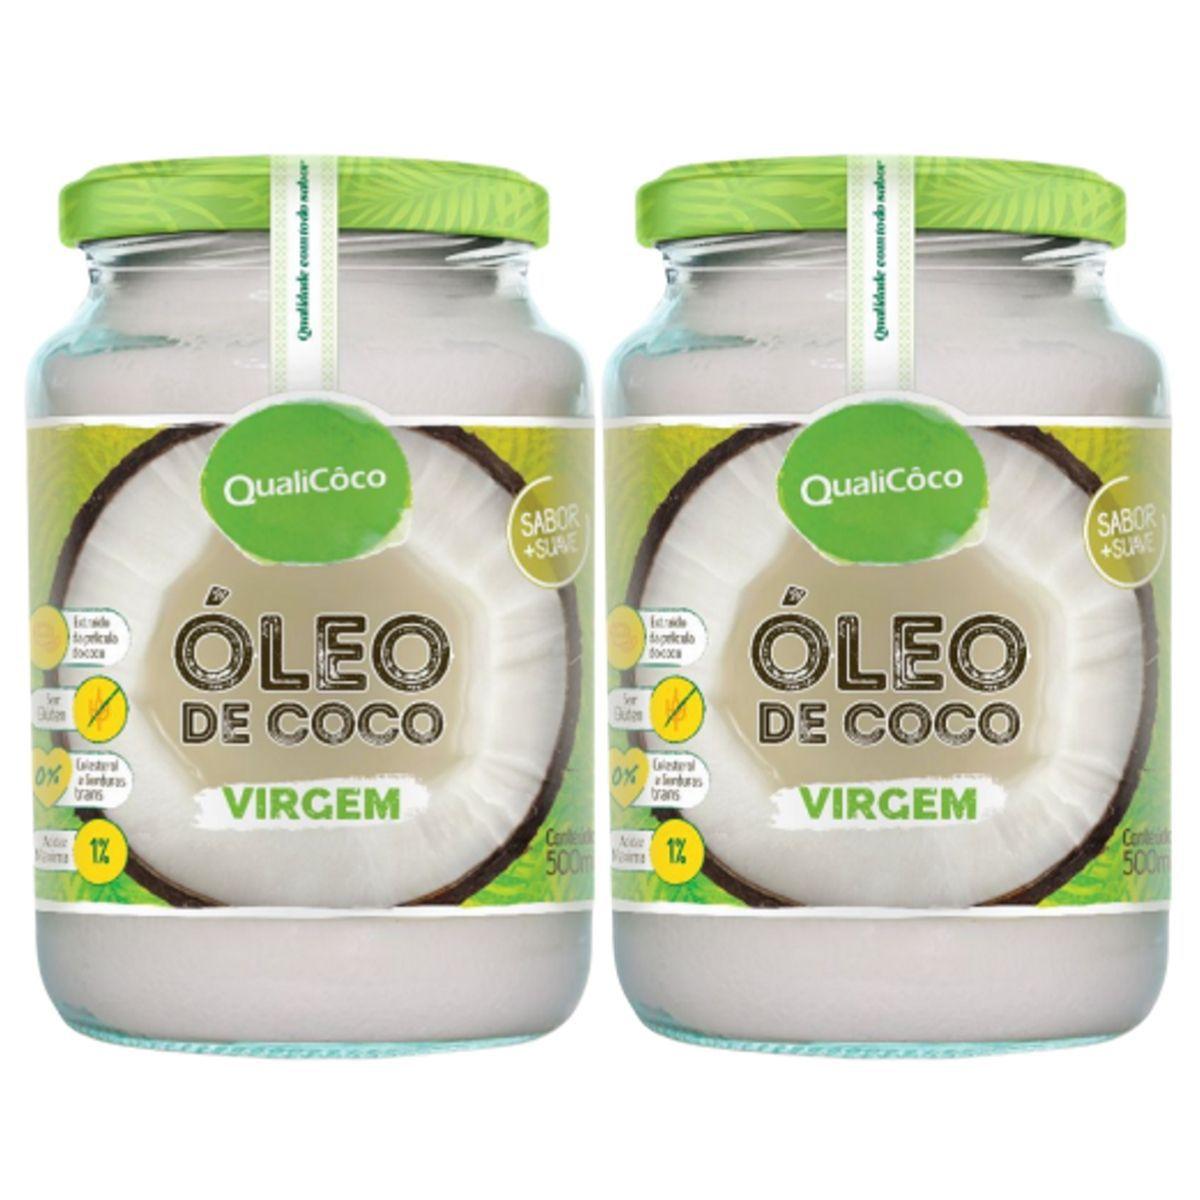 Kit 2 Óleo De Coco Virgem Prensado A Frio Sem Glúten 500ml - QualiCôco